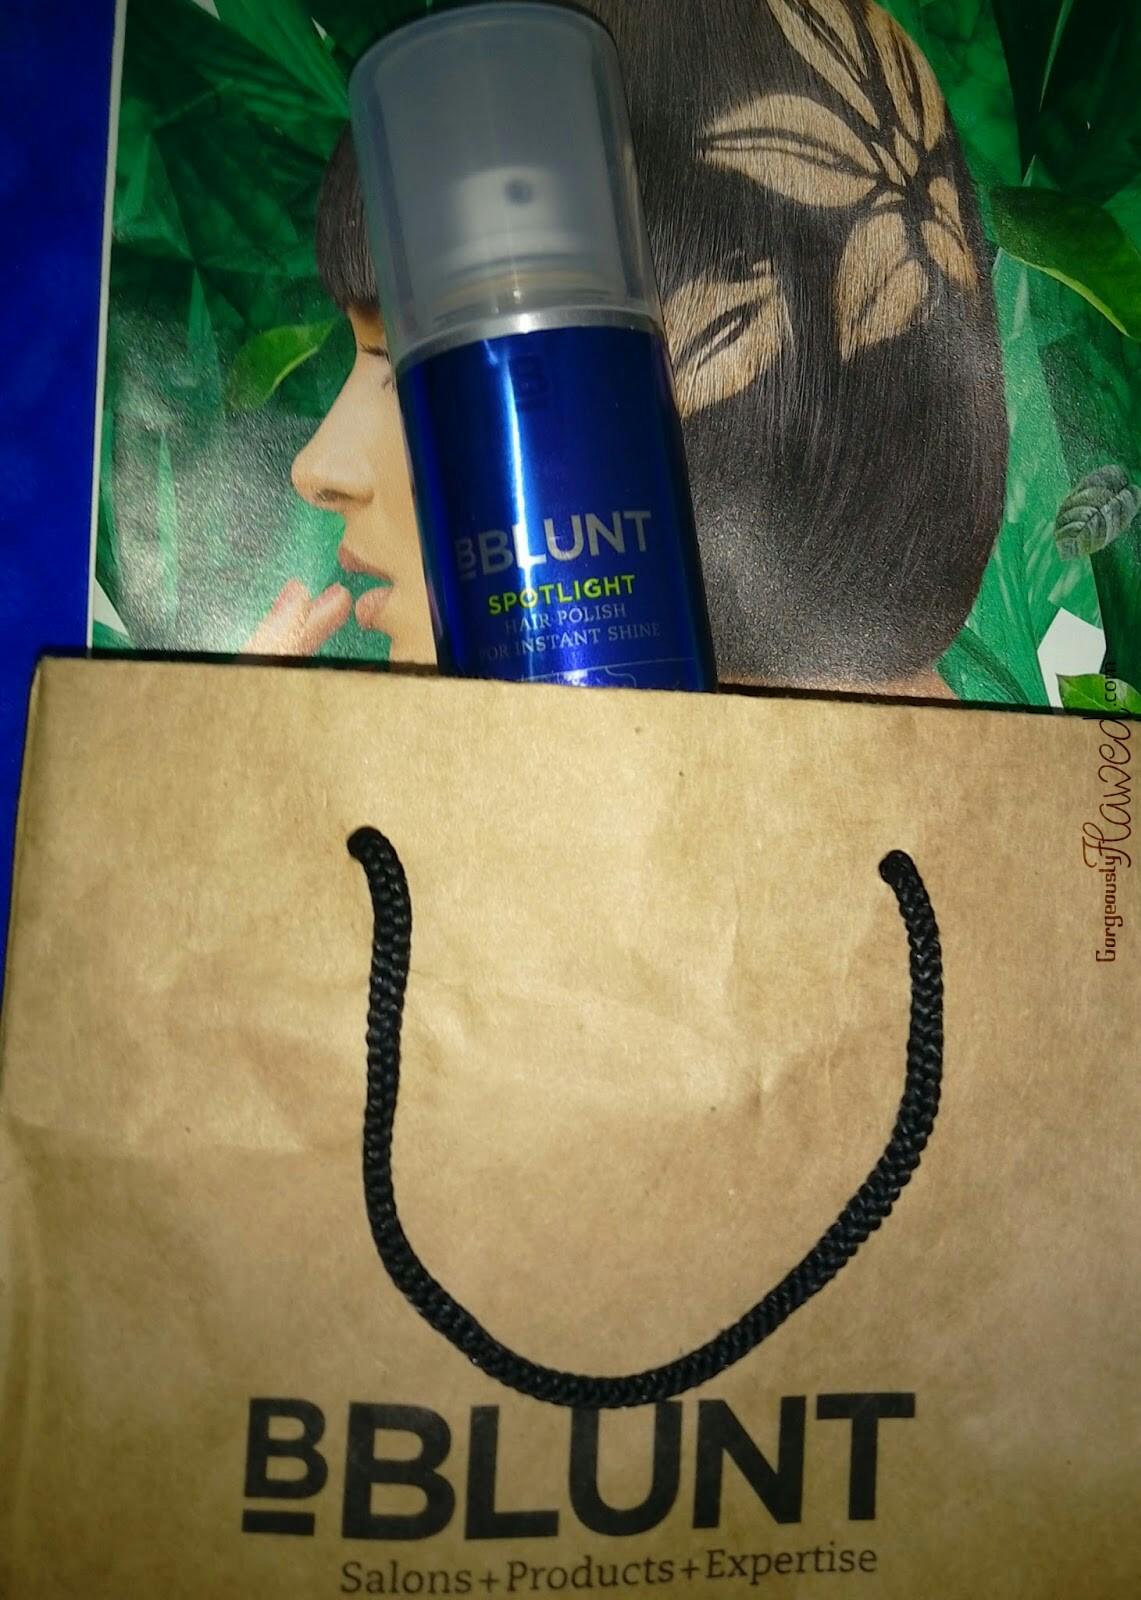 BBLUNT Spotlight Hair Polish